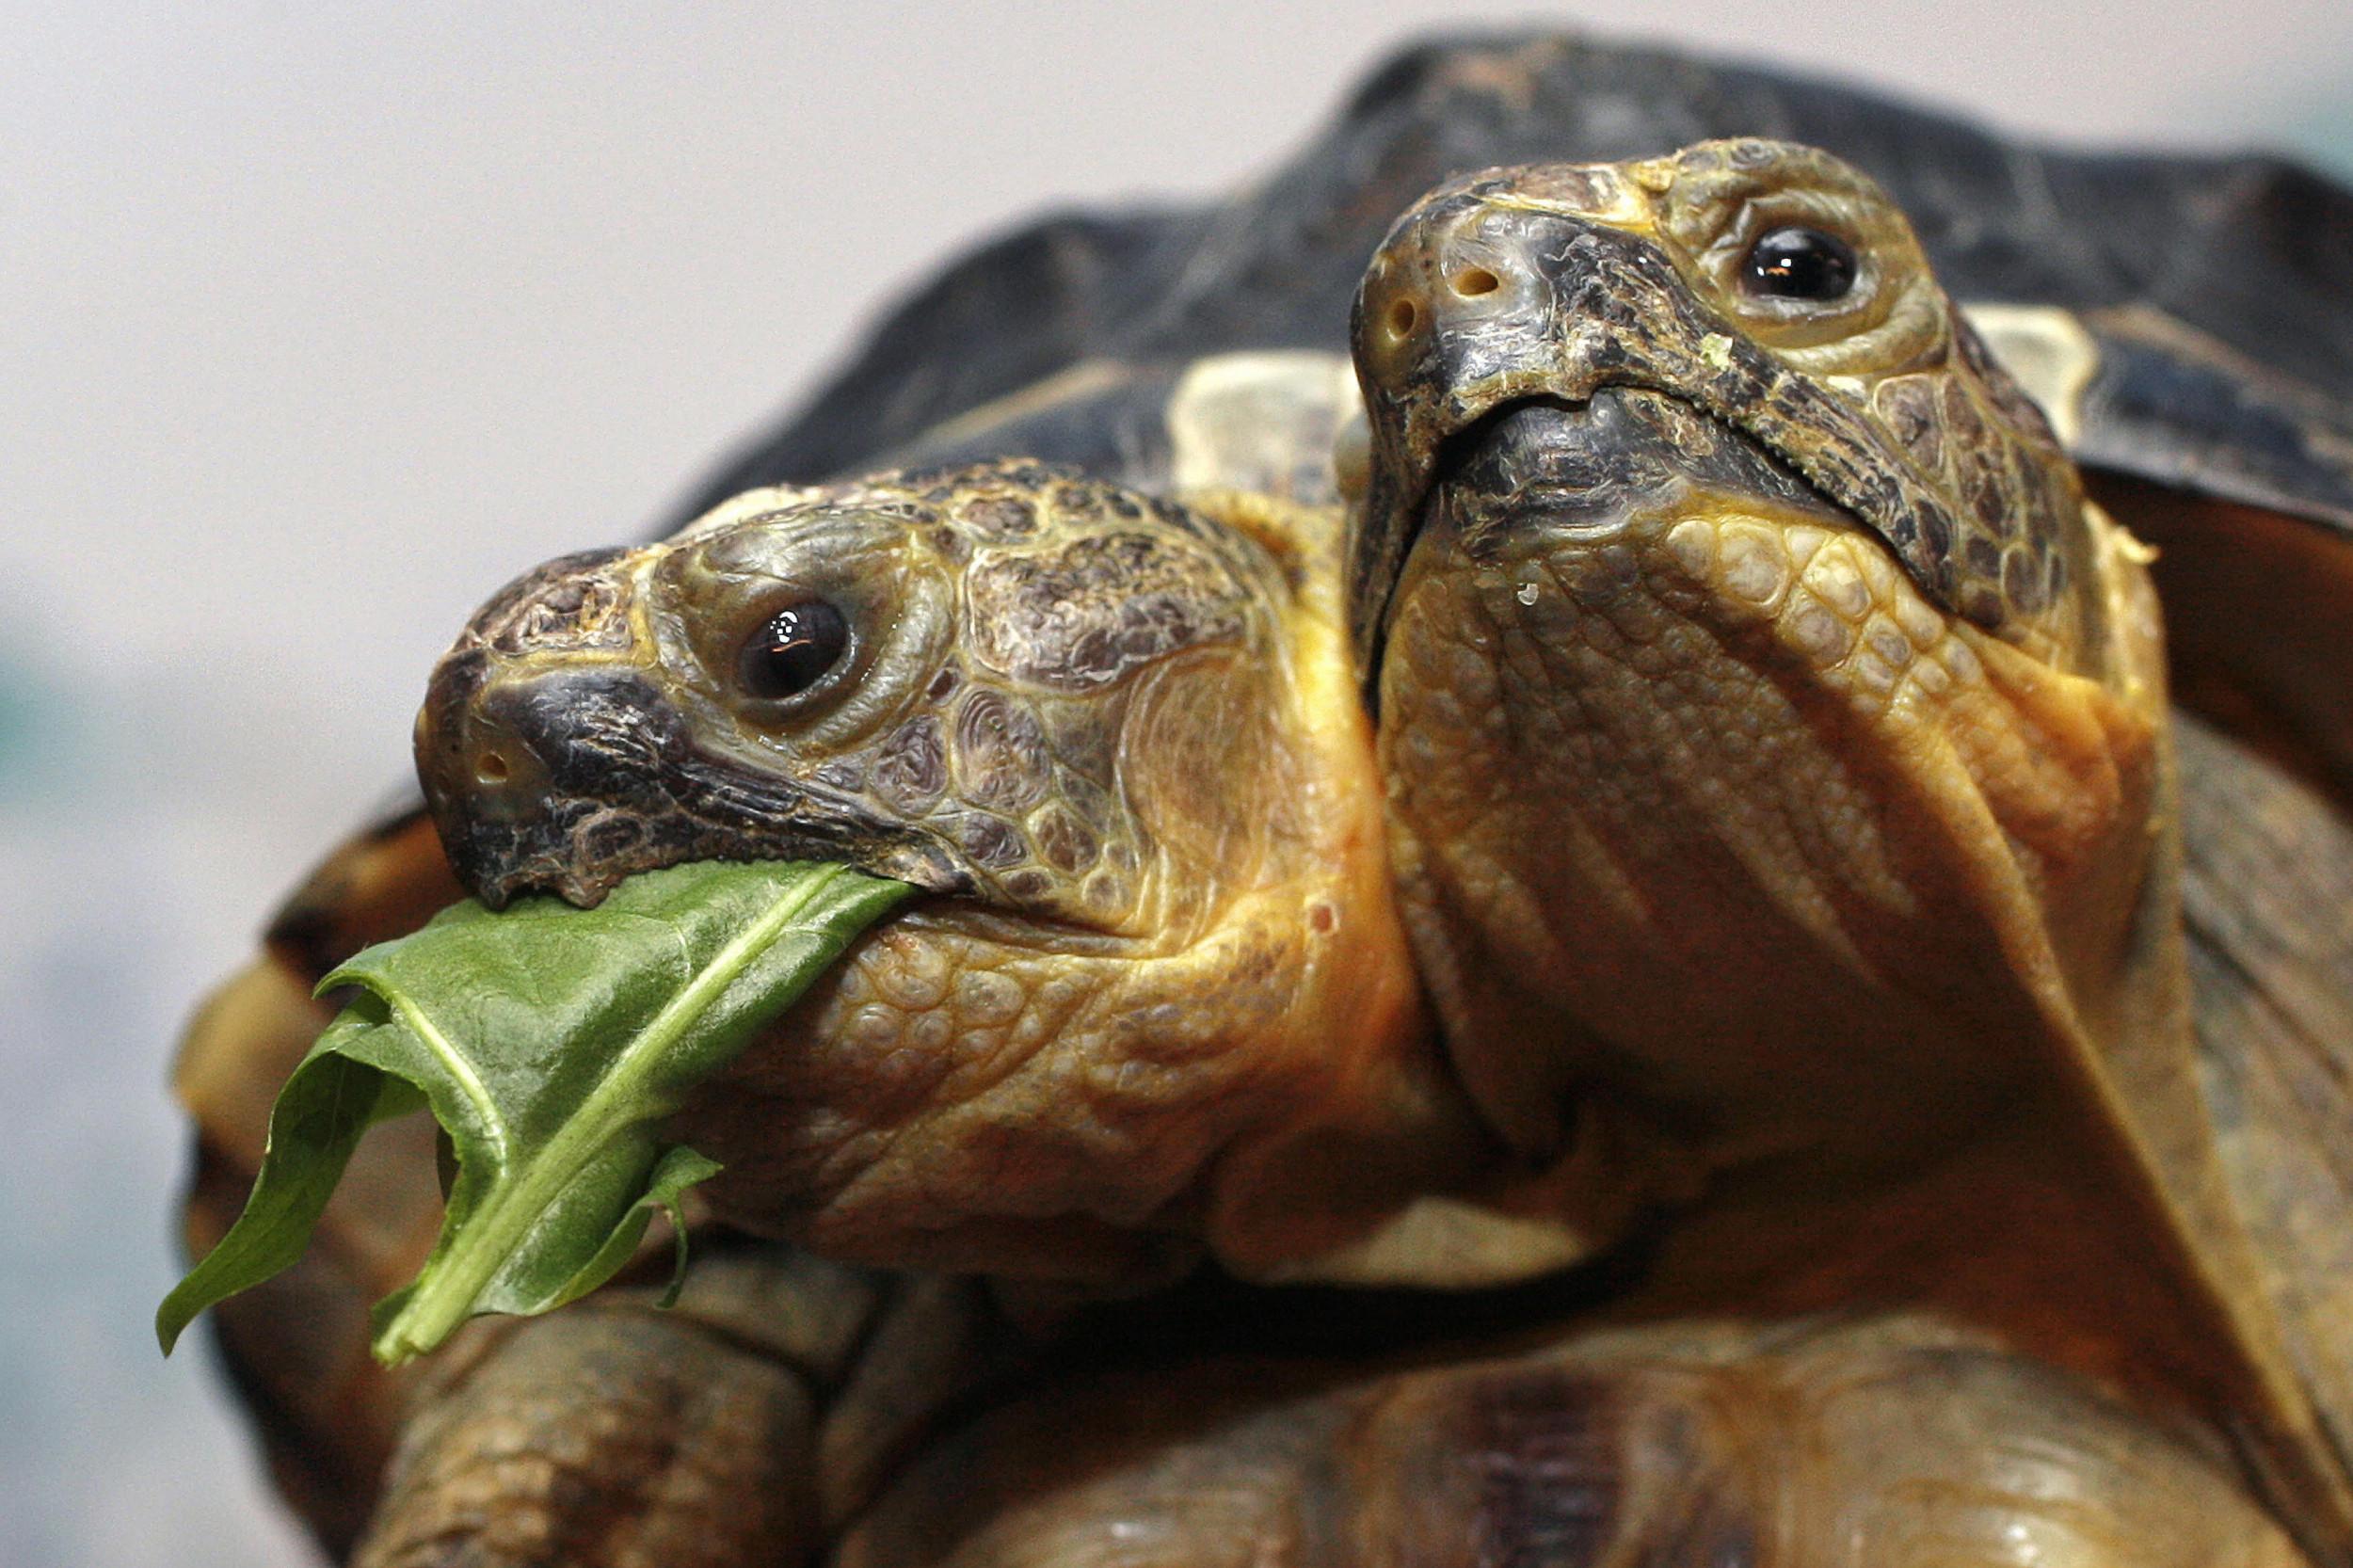 Two-headed turtle at San Antonio Zoo